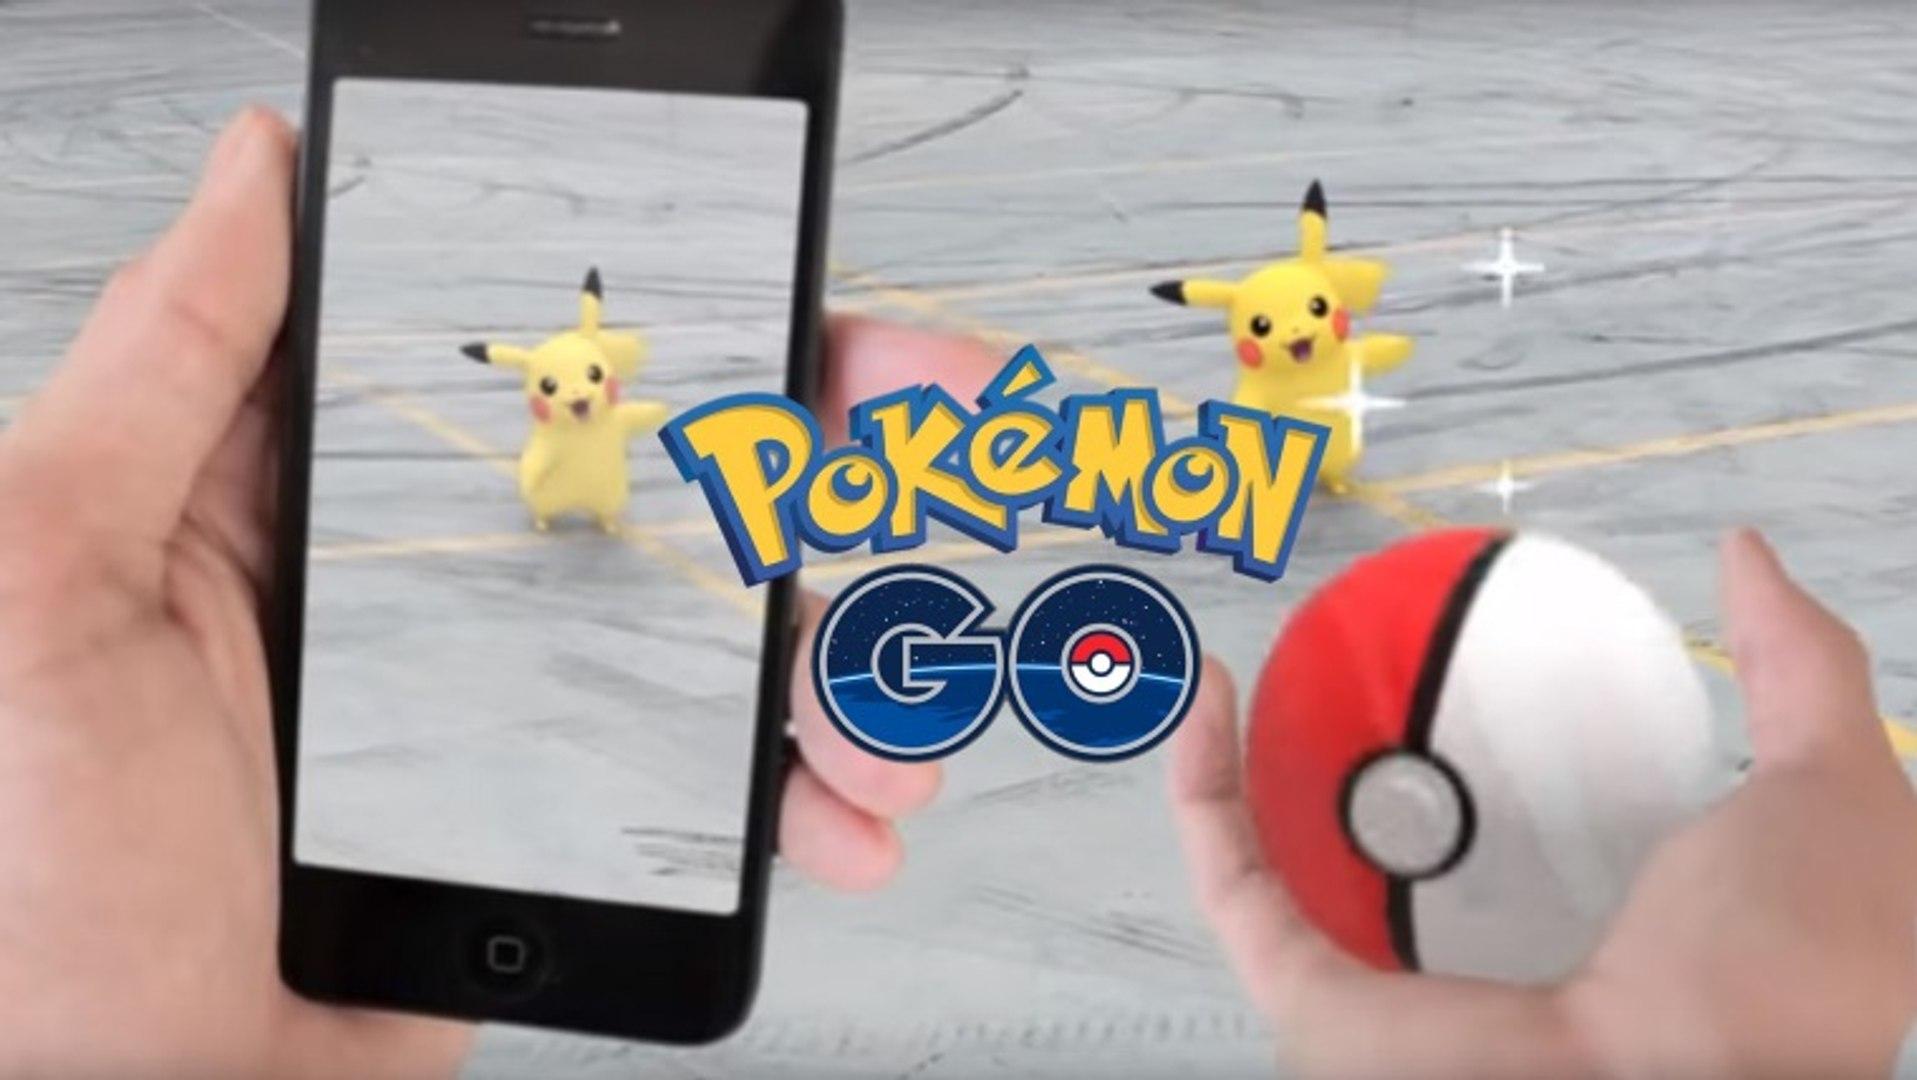 How To Catch Rare Pokemon In Pokemon Go Game | Pokemon Latest News | Pokemon Go Updates